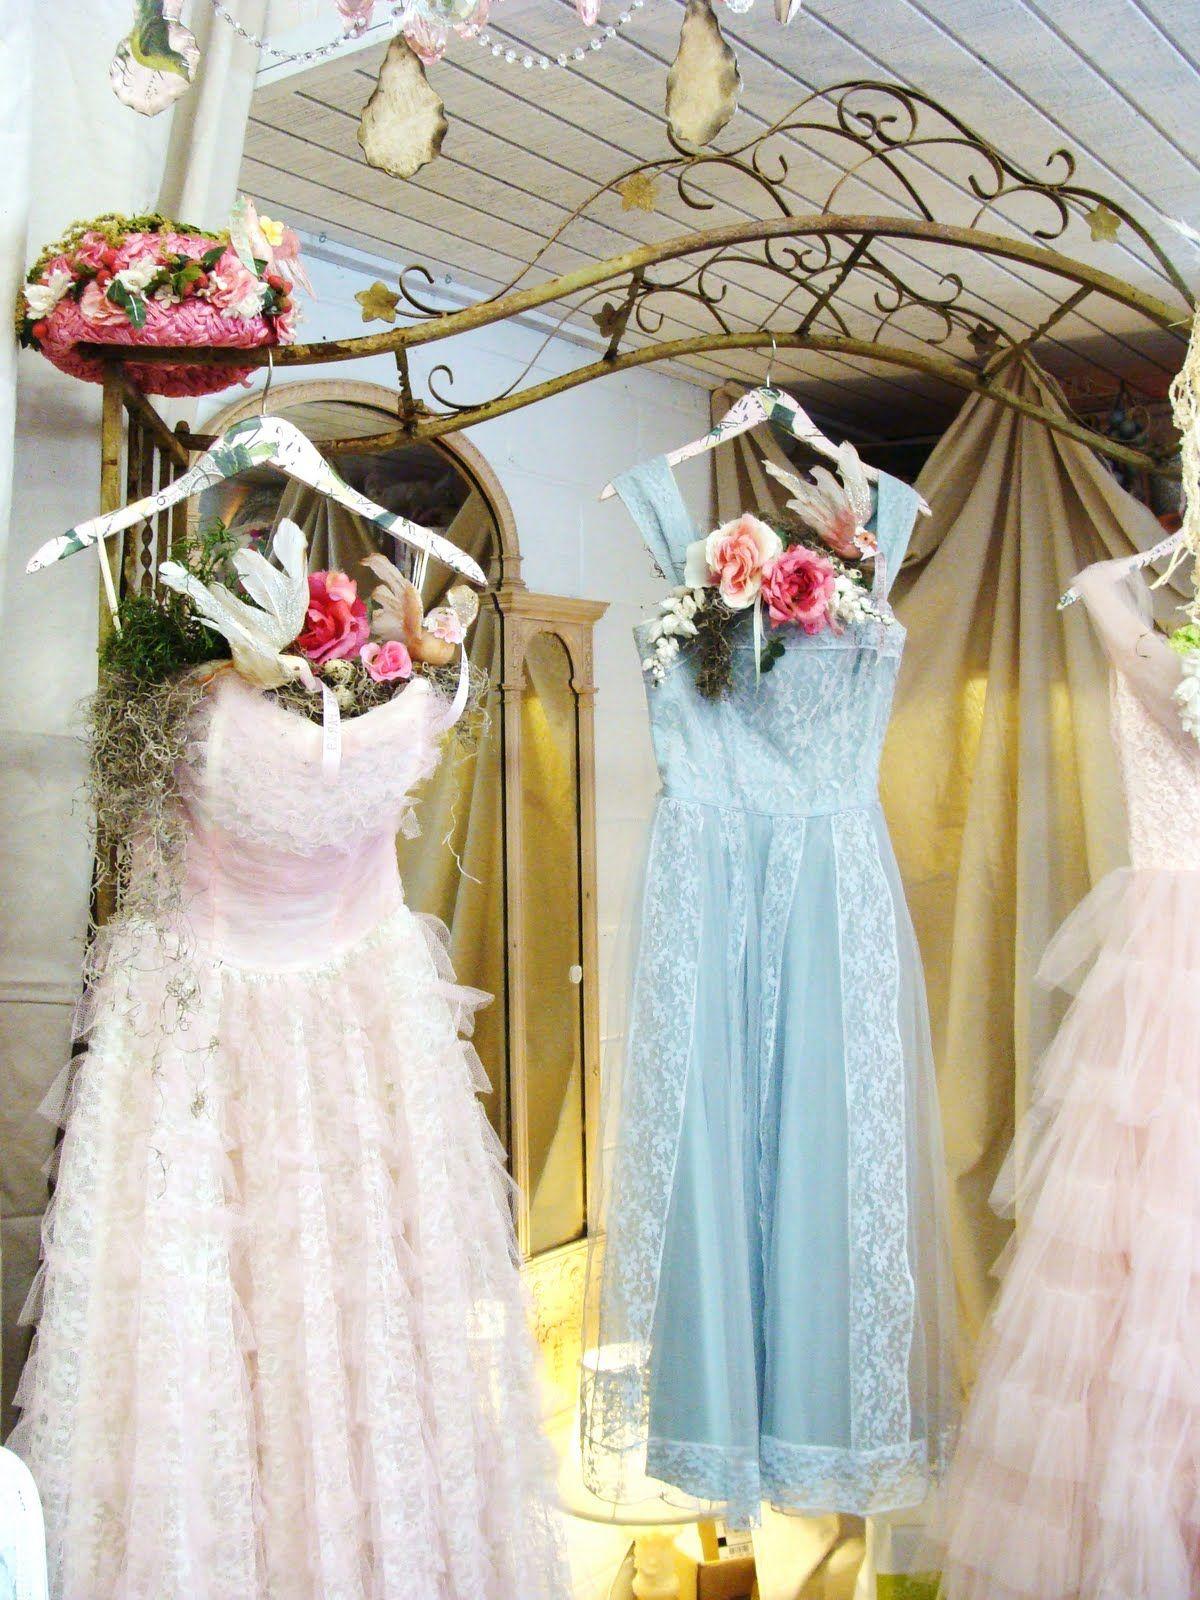 Pin by susie hanks swain on eηḉнαηtḯᾔℊ dress forms